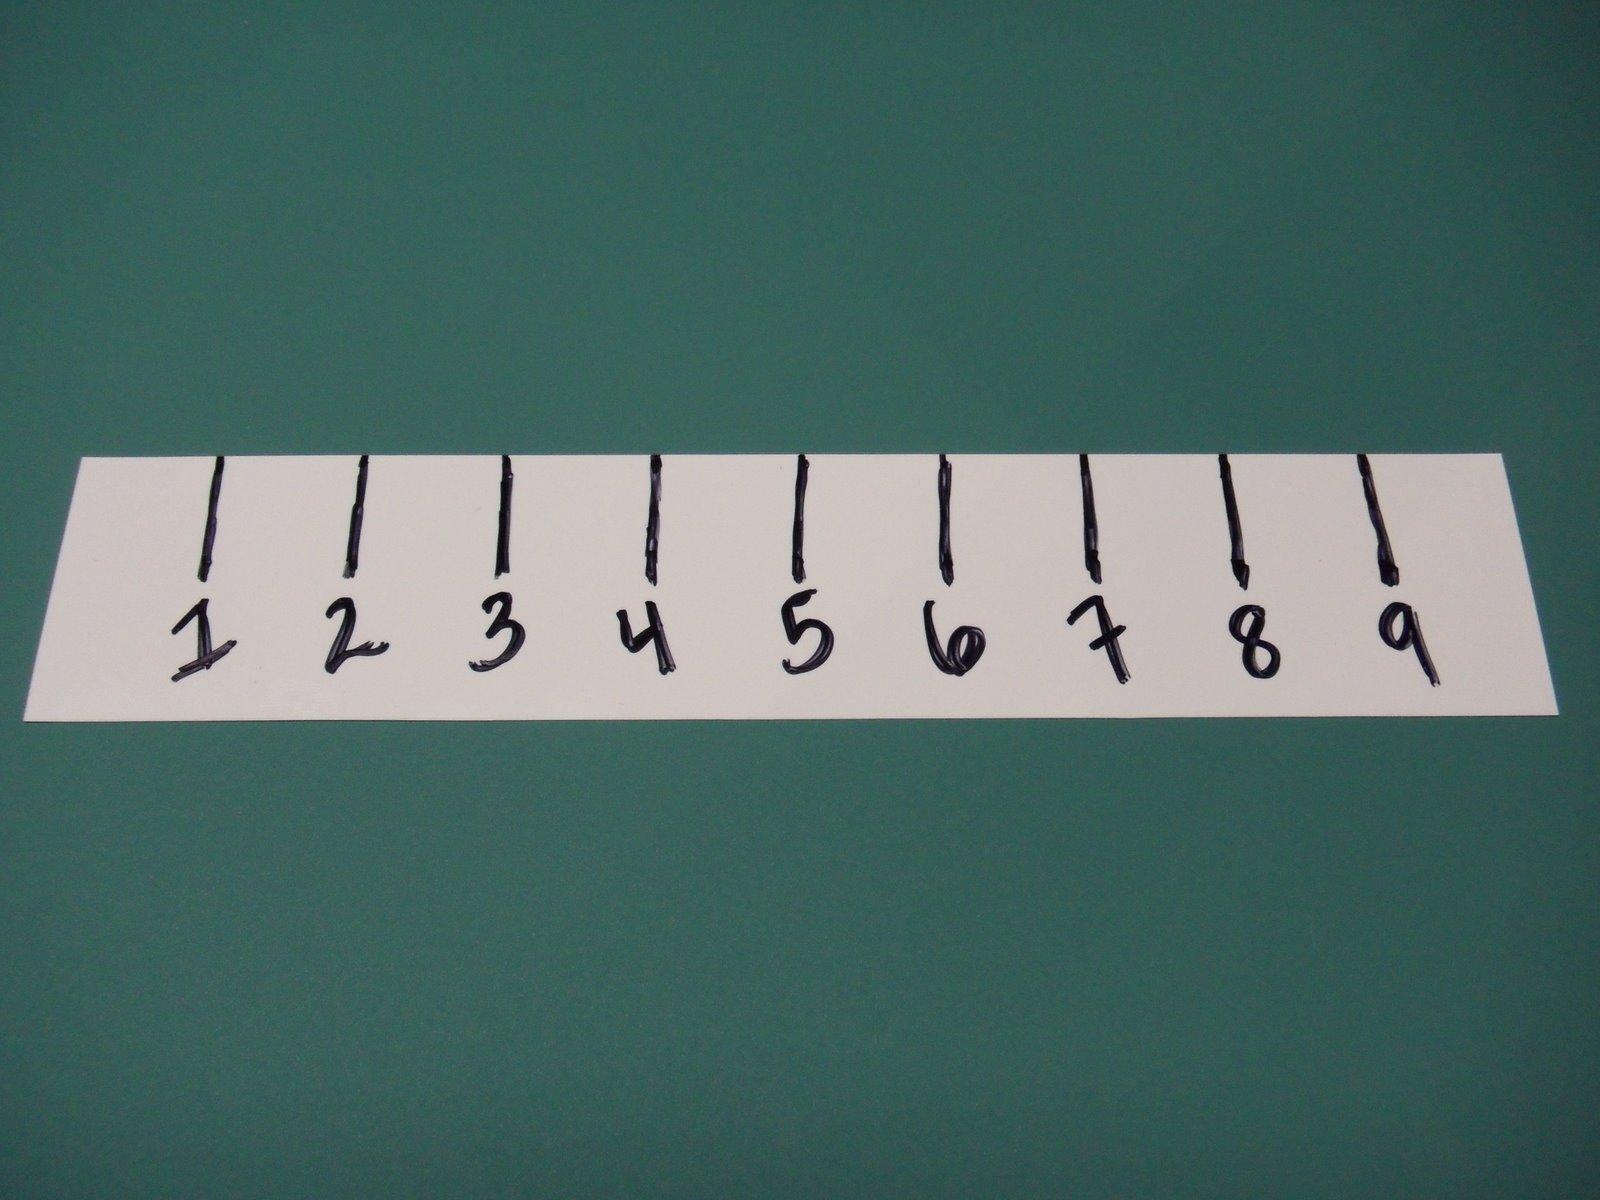 Metric Ruler Actual Size Image  pective